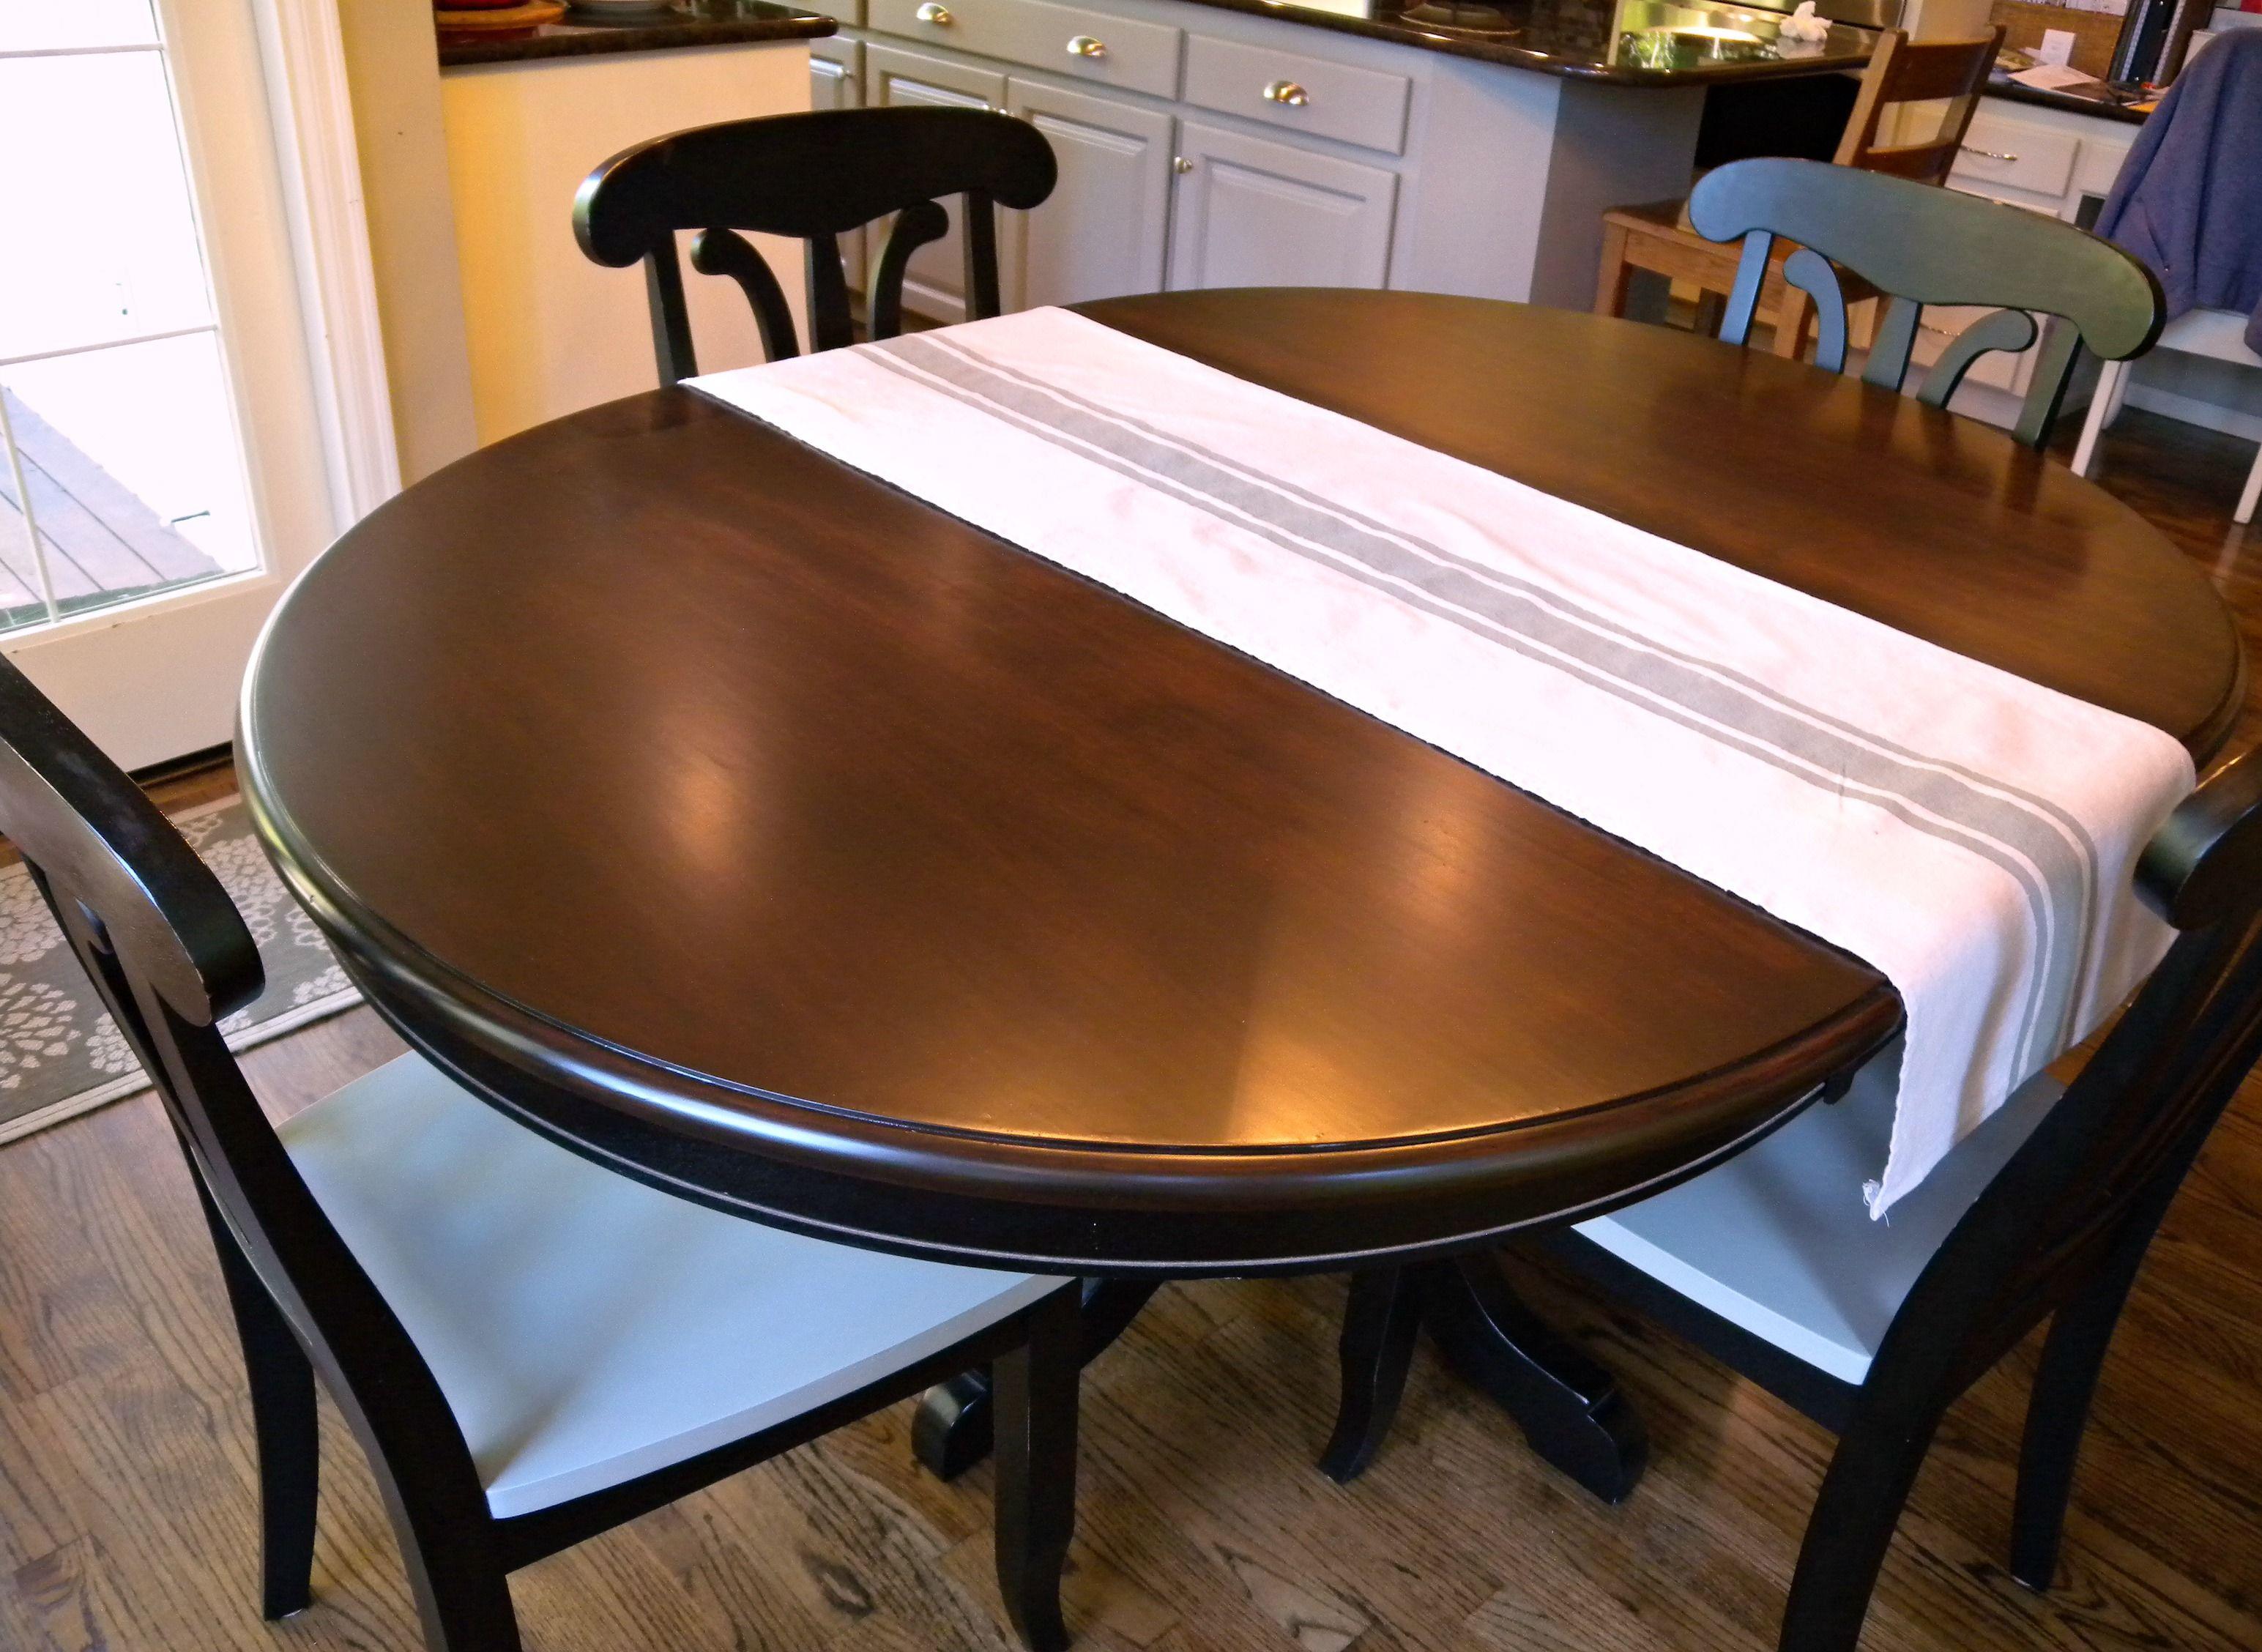 kitchen table update using java gel stain diy